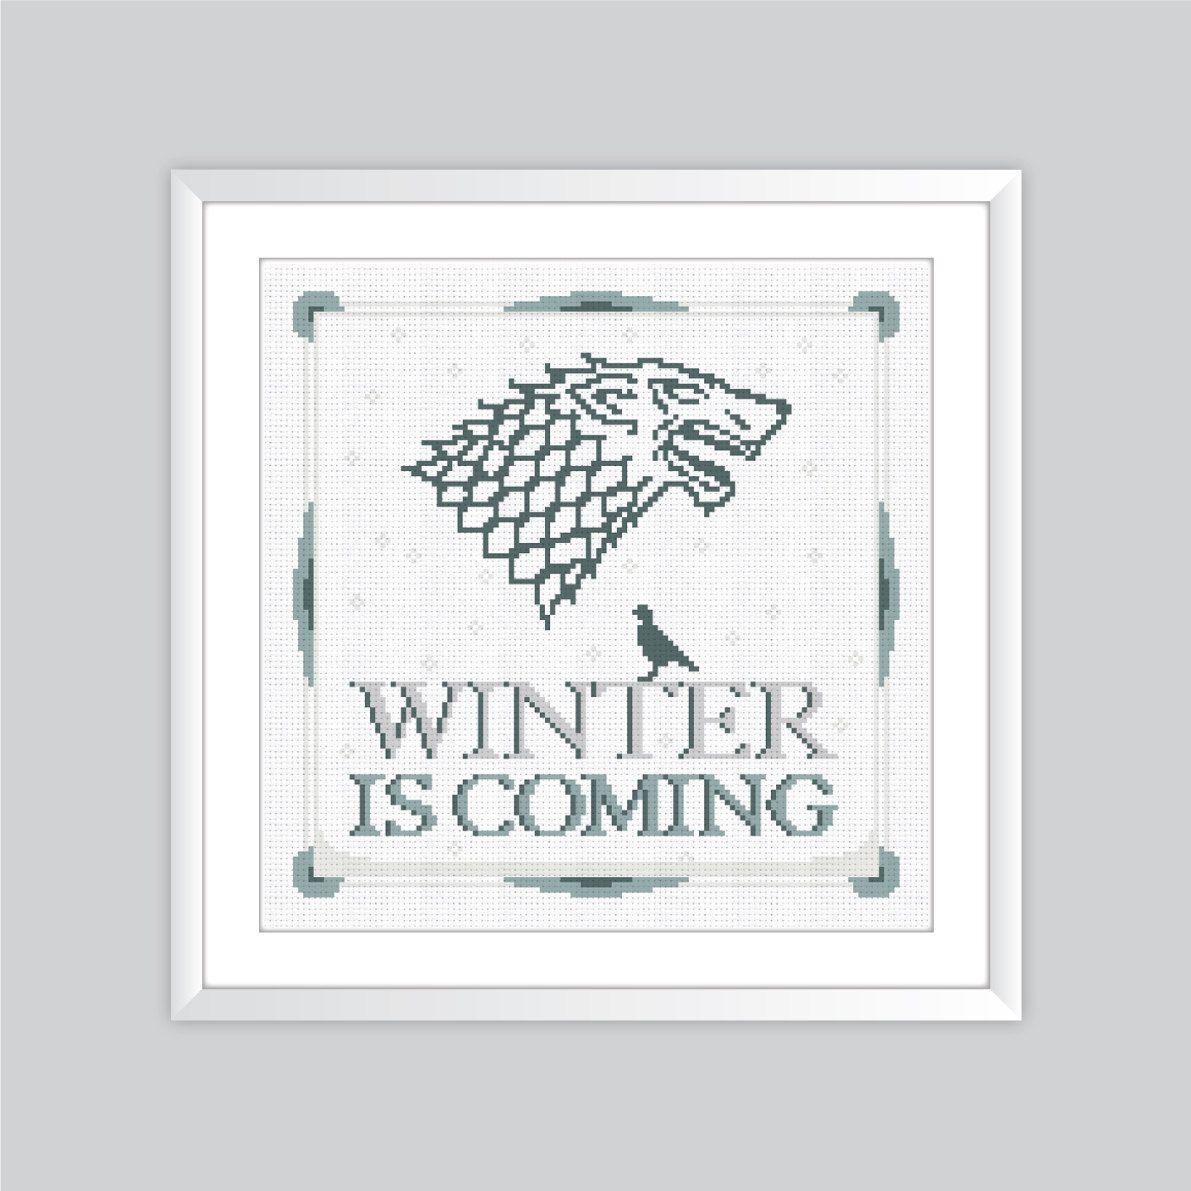 Game of Thrones House Stark Crest - Cross Stitch Pattern